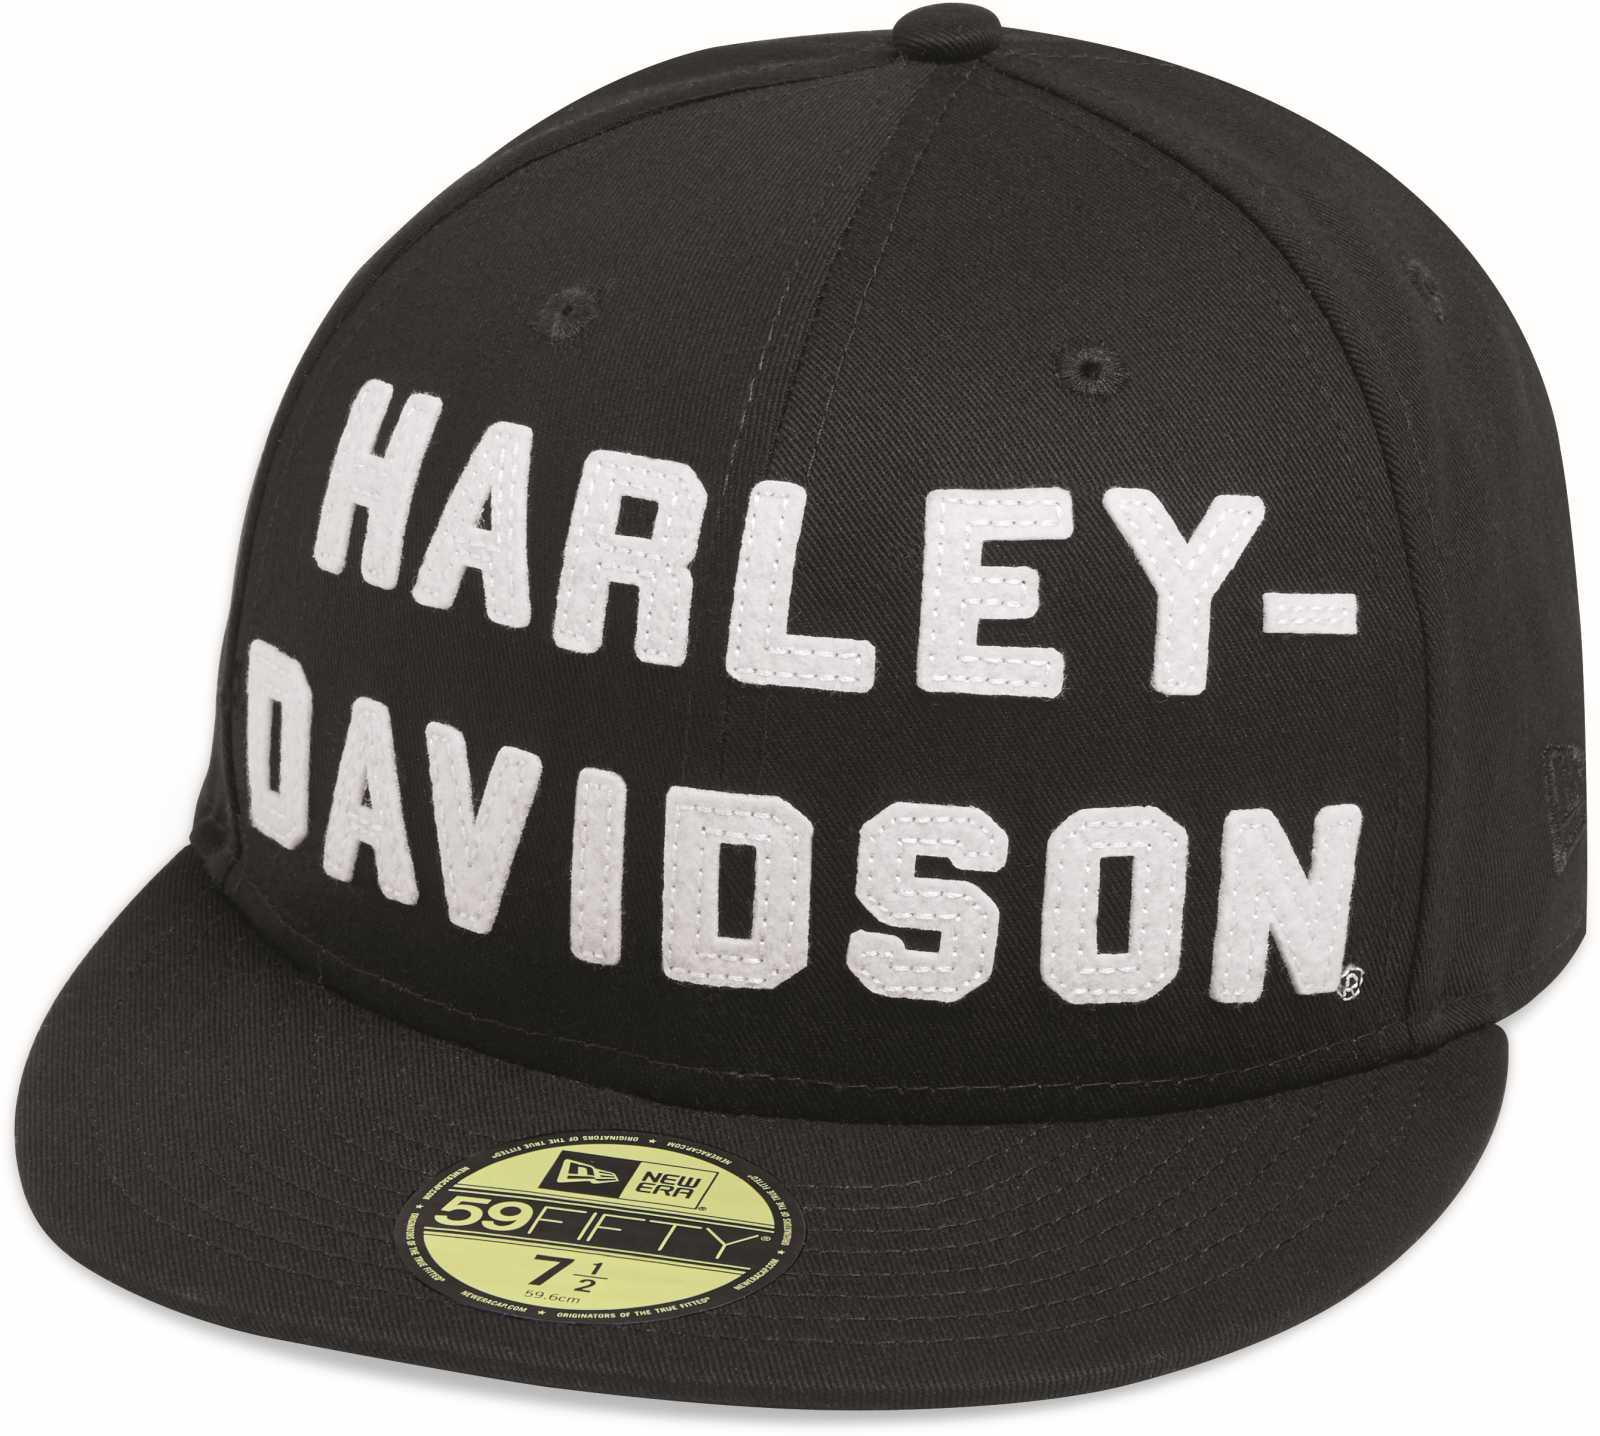 b5aeb61a609 ... H-D Motorclothes Harley-Davidson Baseball Cap Felt Letter 59Fifty -  99467-19VM ...